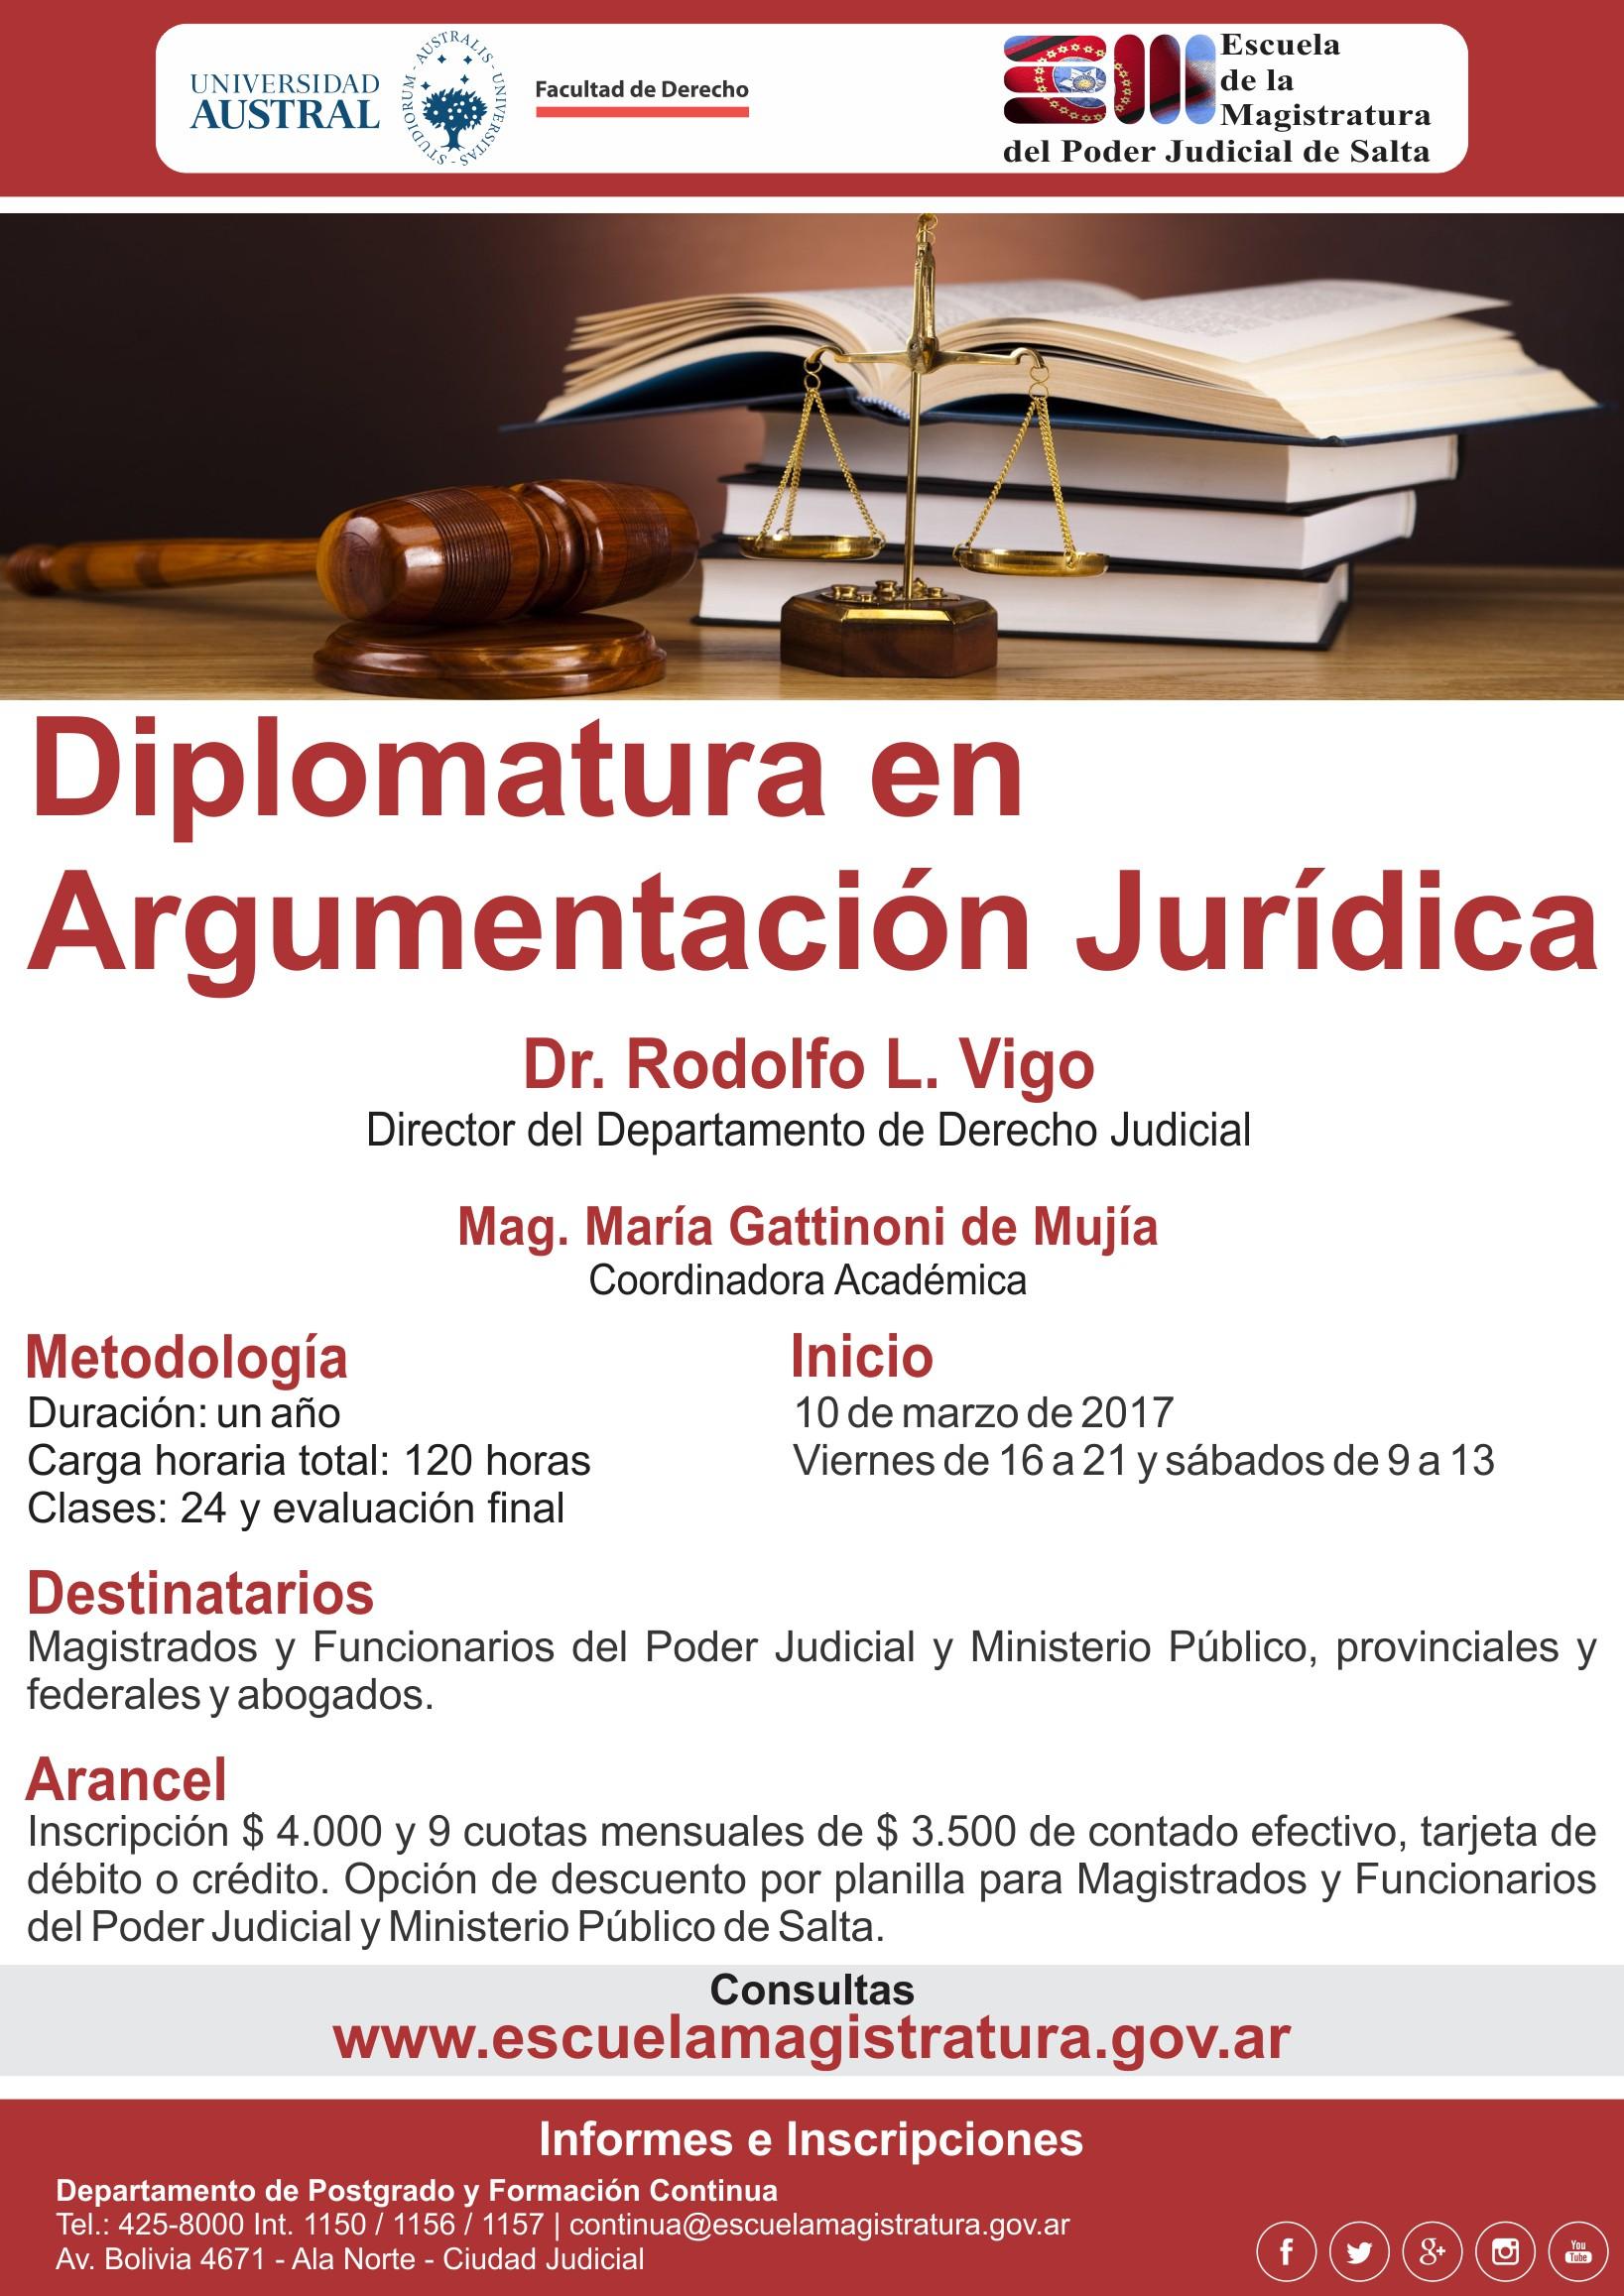 diplomatura-en-argumentacion-juridica1